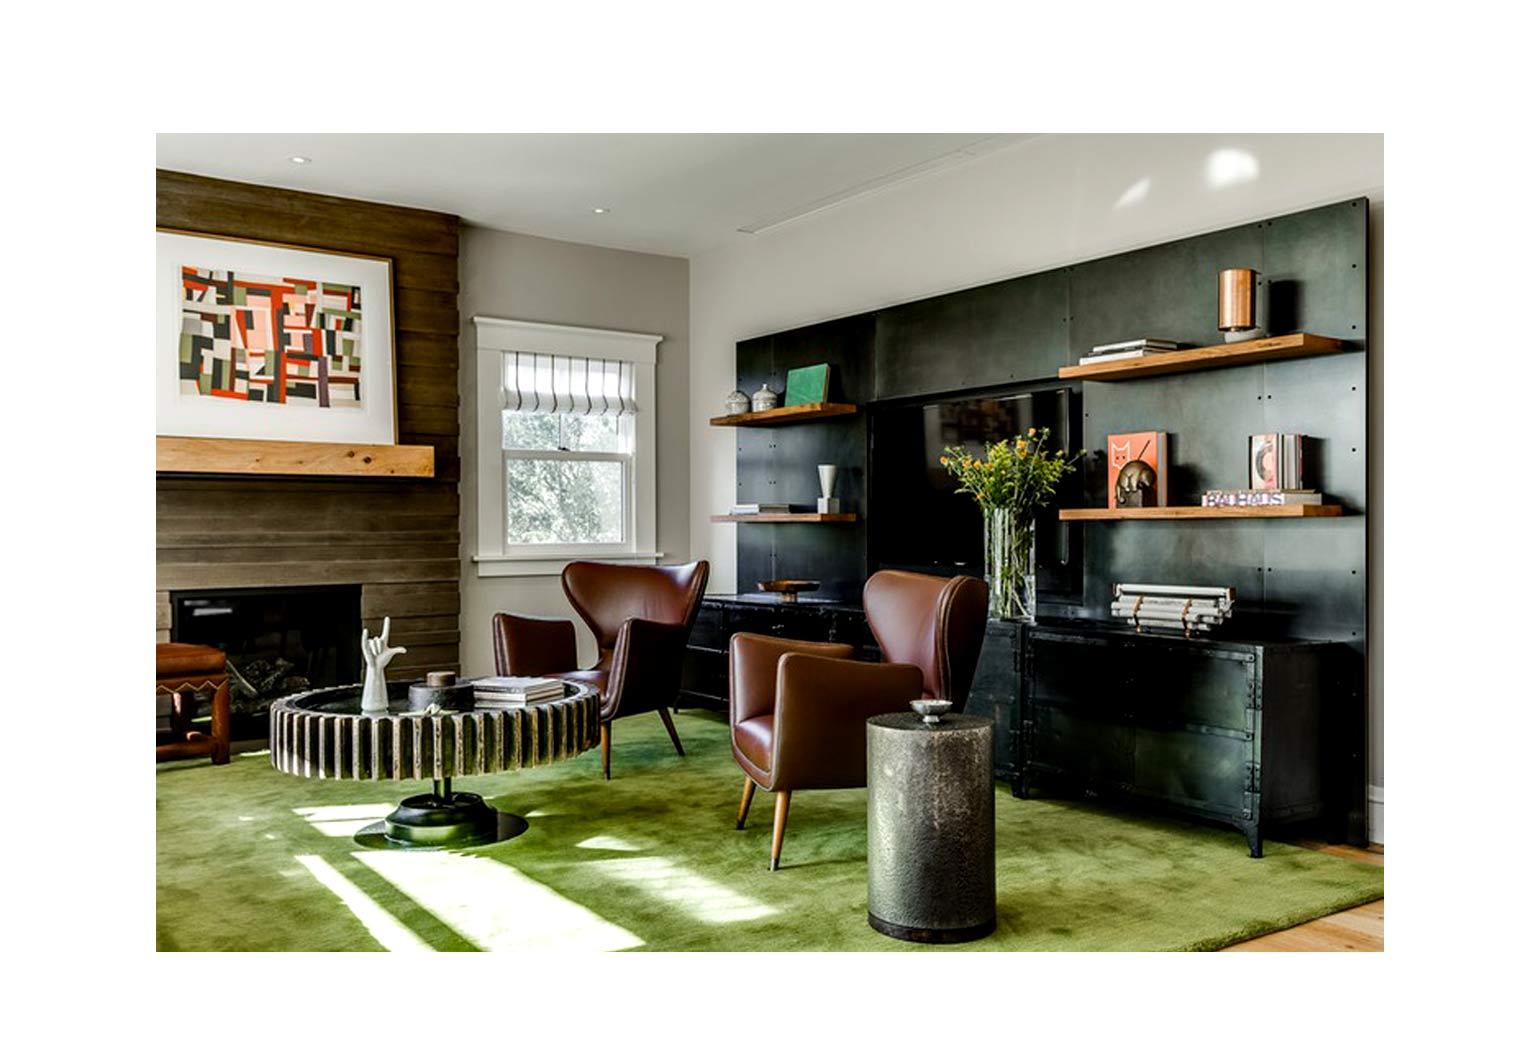 Design An Art centric Room012jpg - چگونه یک اتاق هنری را طراحی کنیم؟